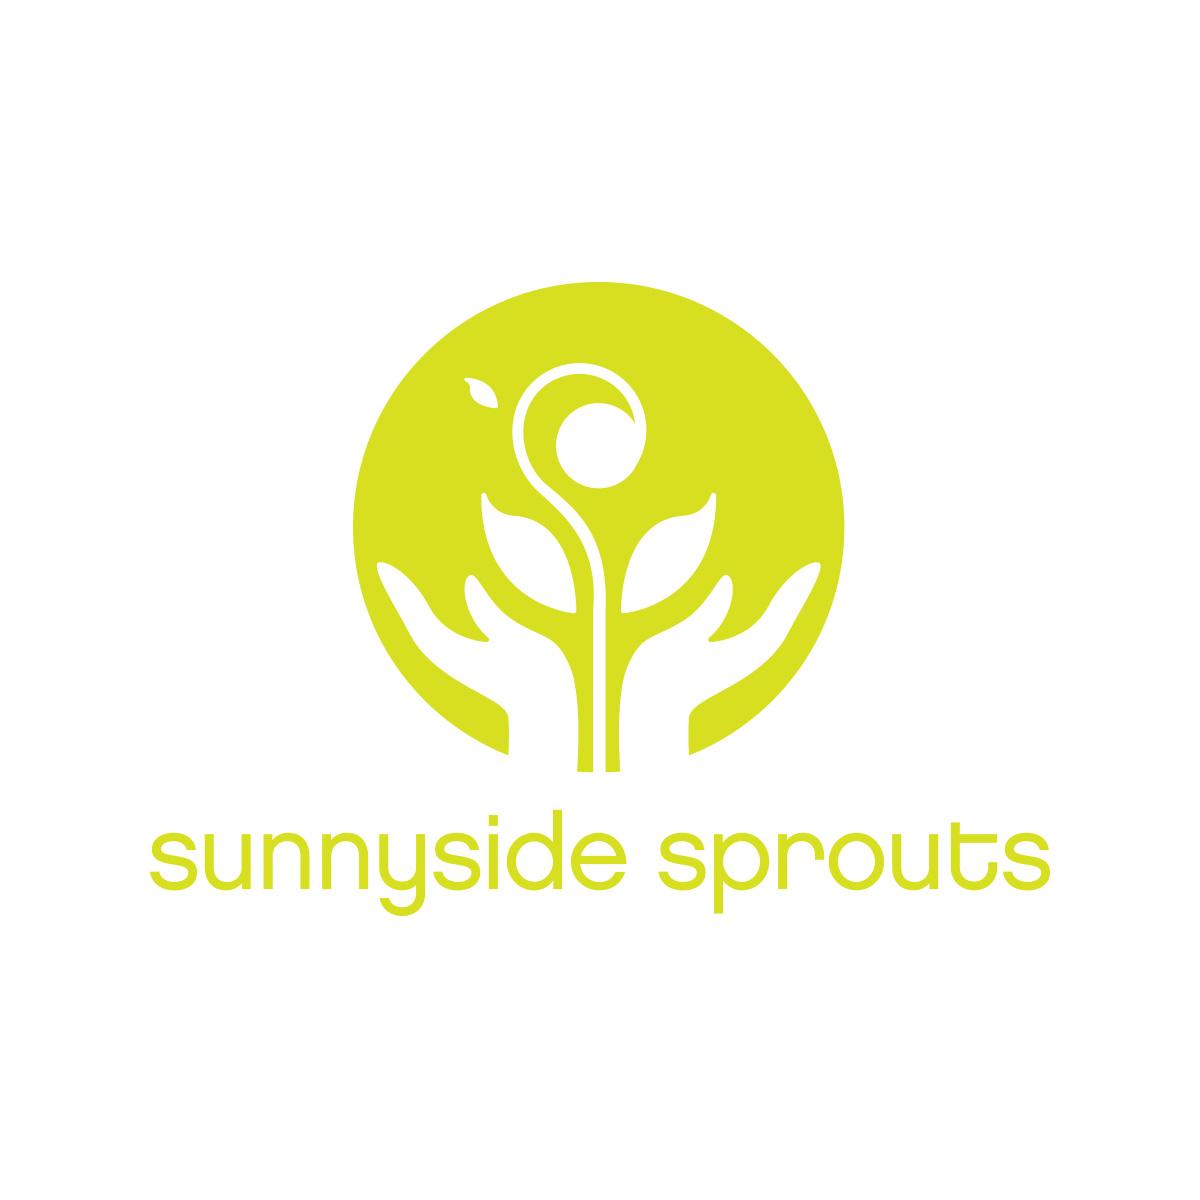 logo_0003_sunnyside sprouts 3.jpg